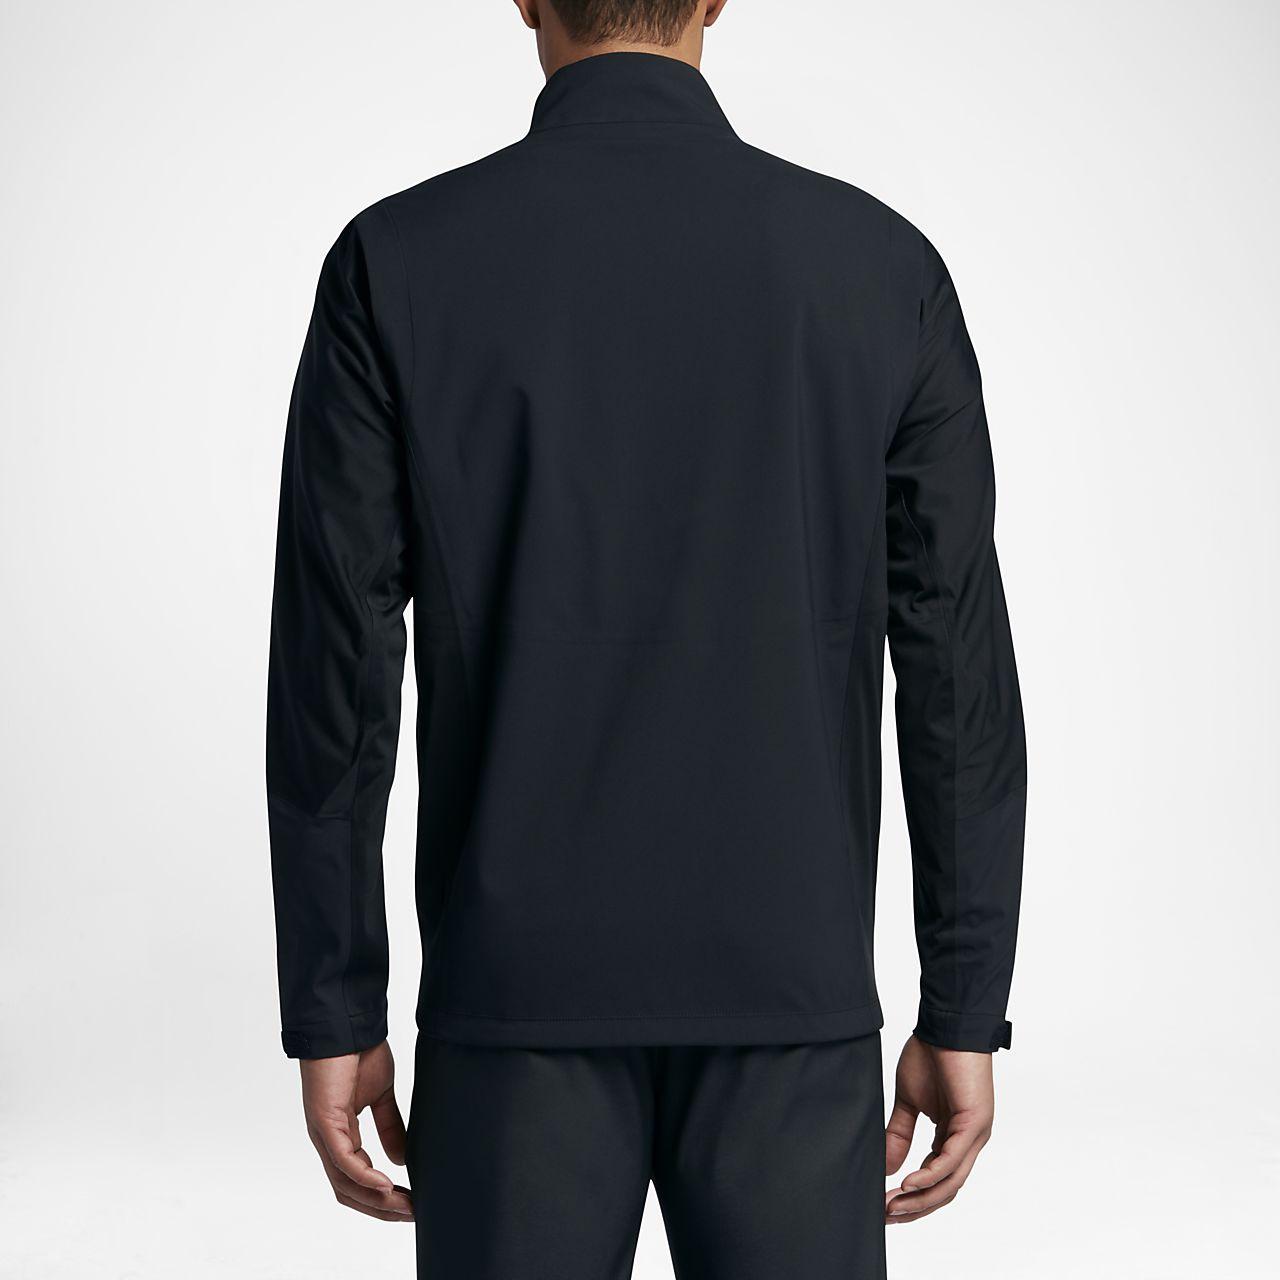 ... Nike Hyperadapt Storm-FIT Full-Zip Men's Golf Jacket